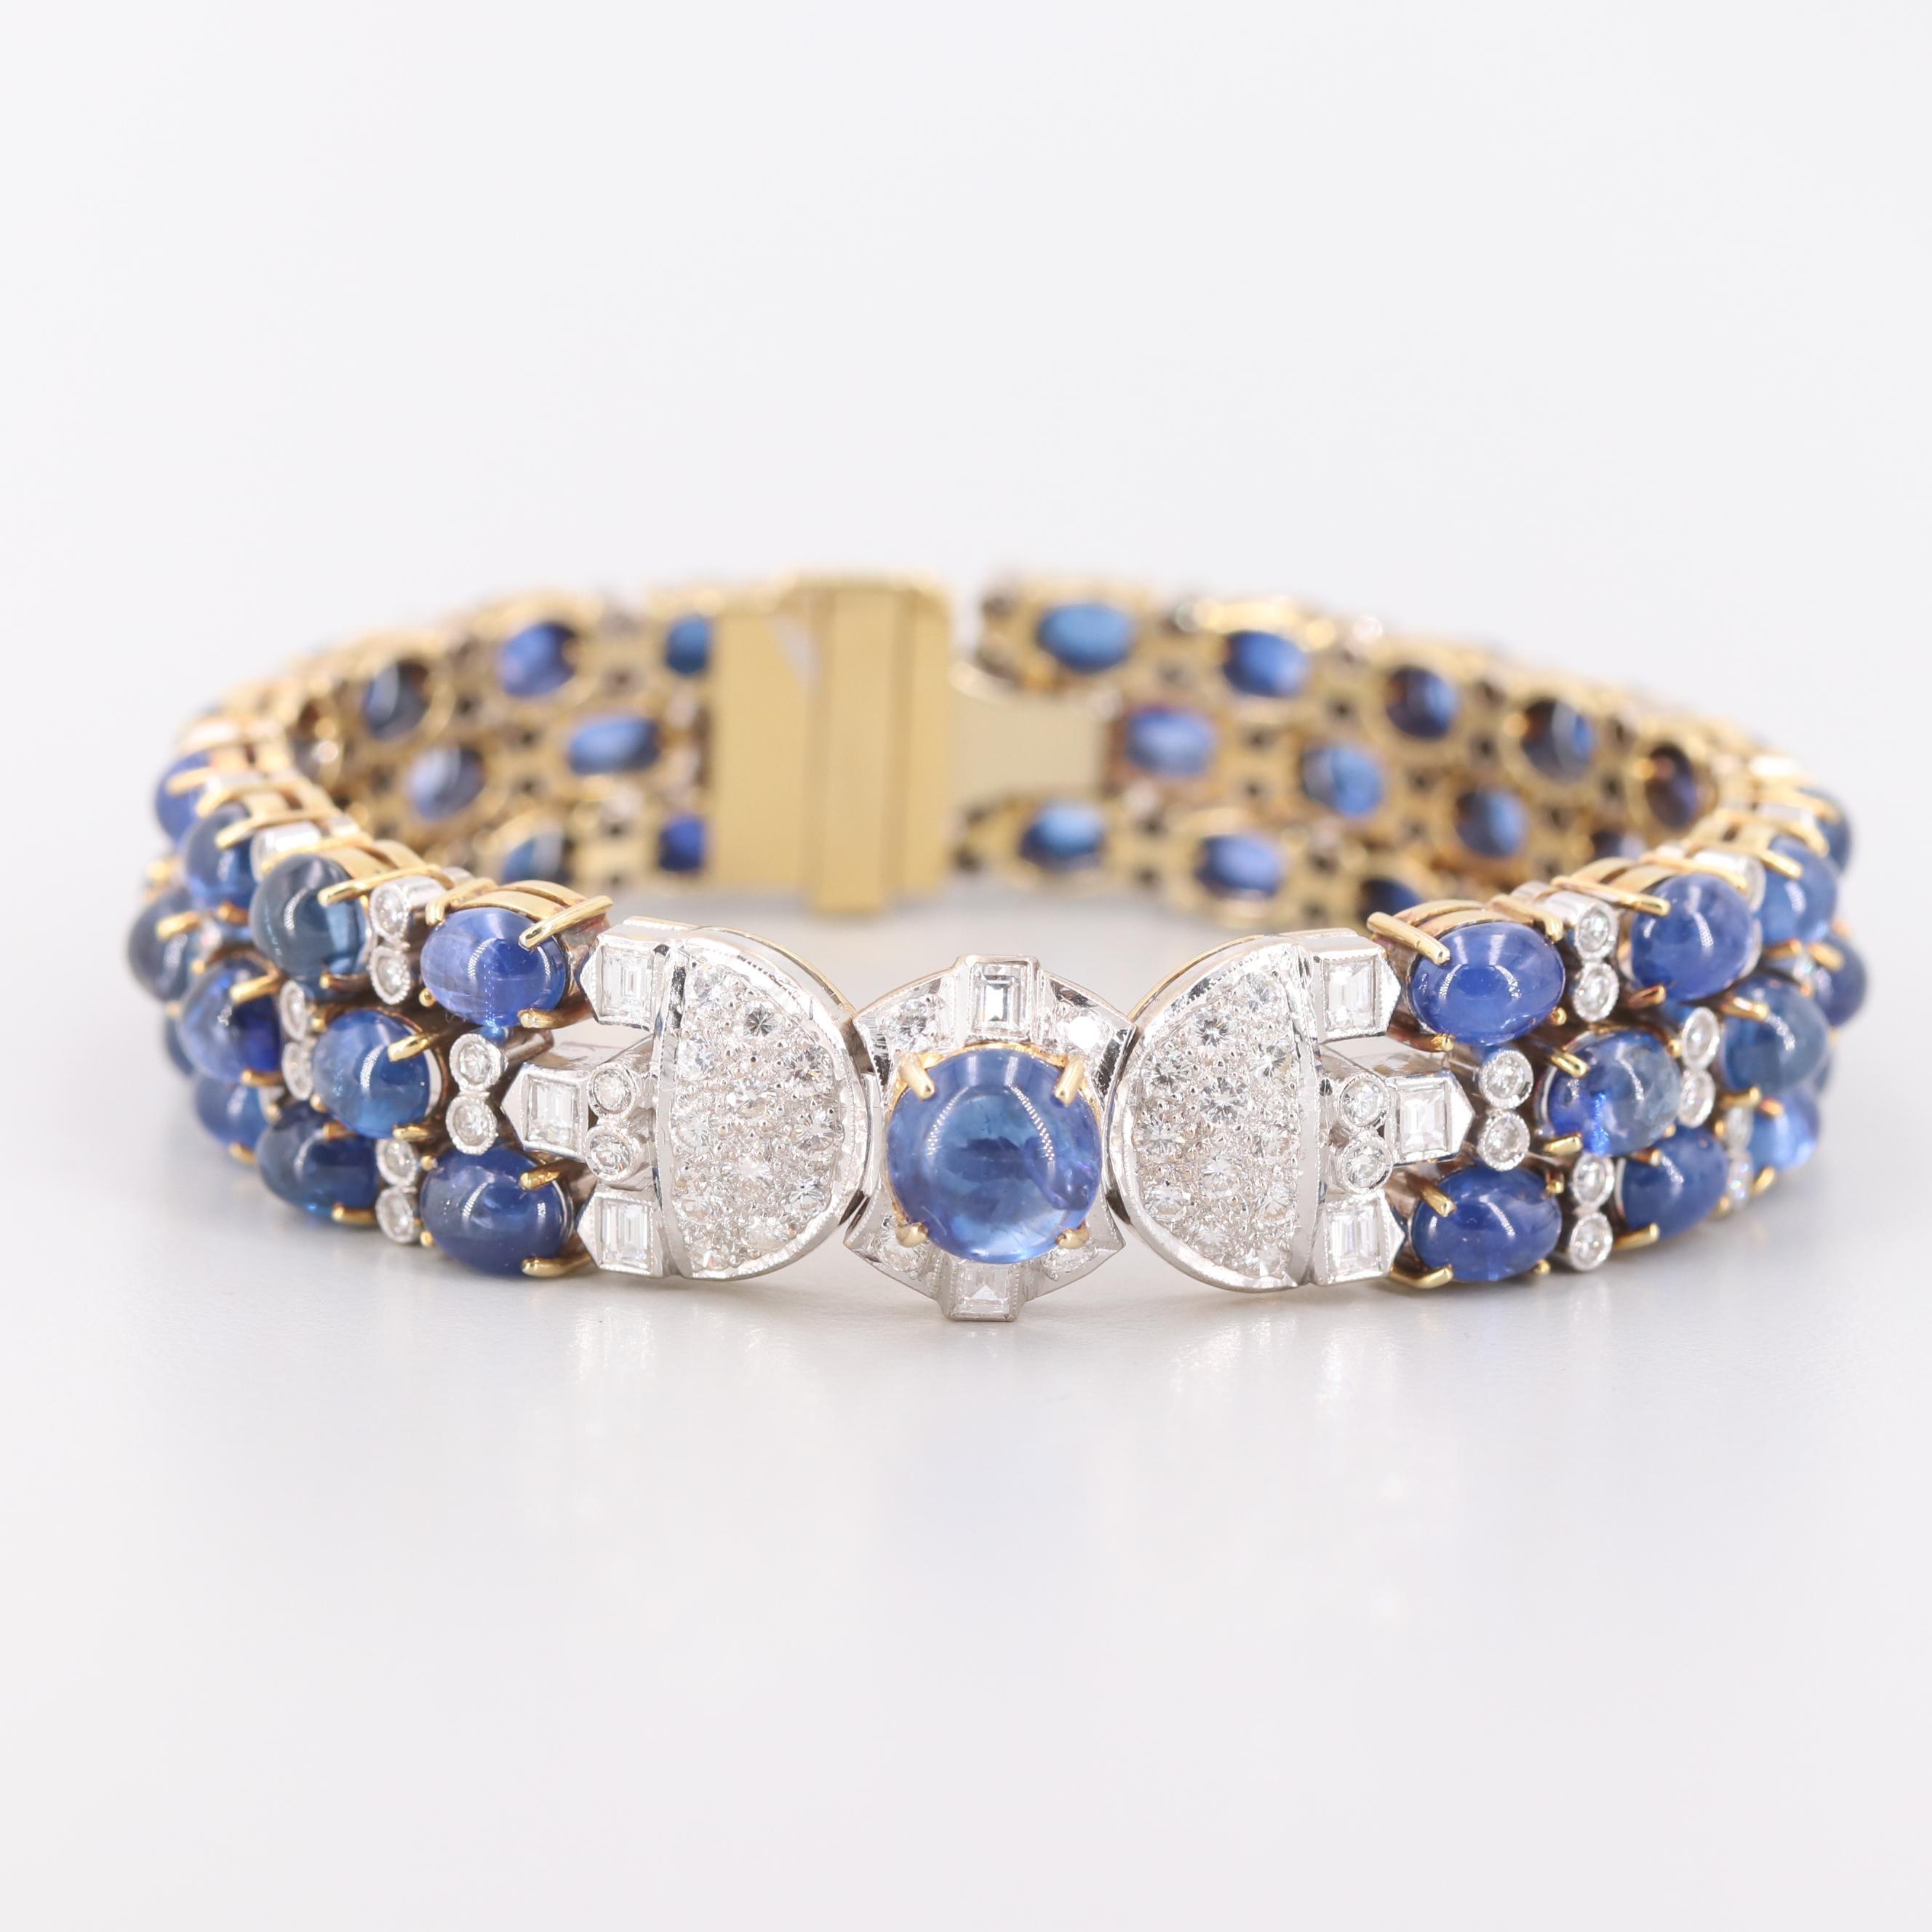 18K Yellow Gold 53.48 CTW Blue Sapphire and 4.25 CTW Diamond Bracelet